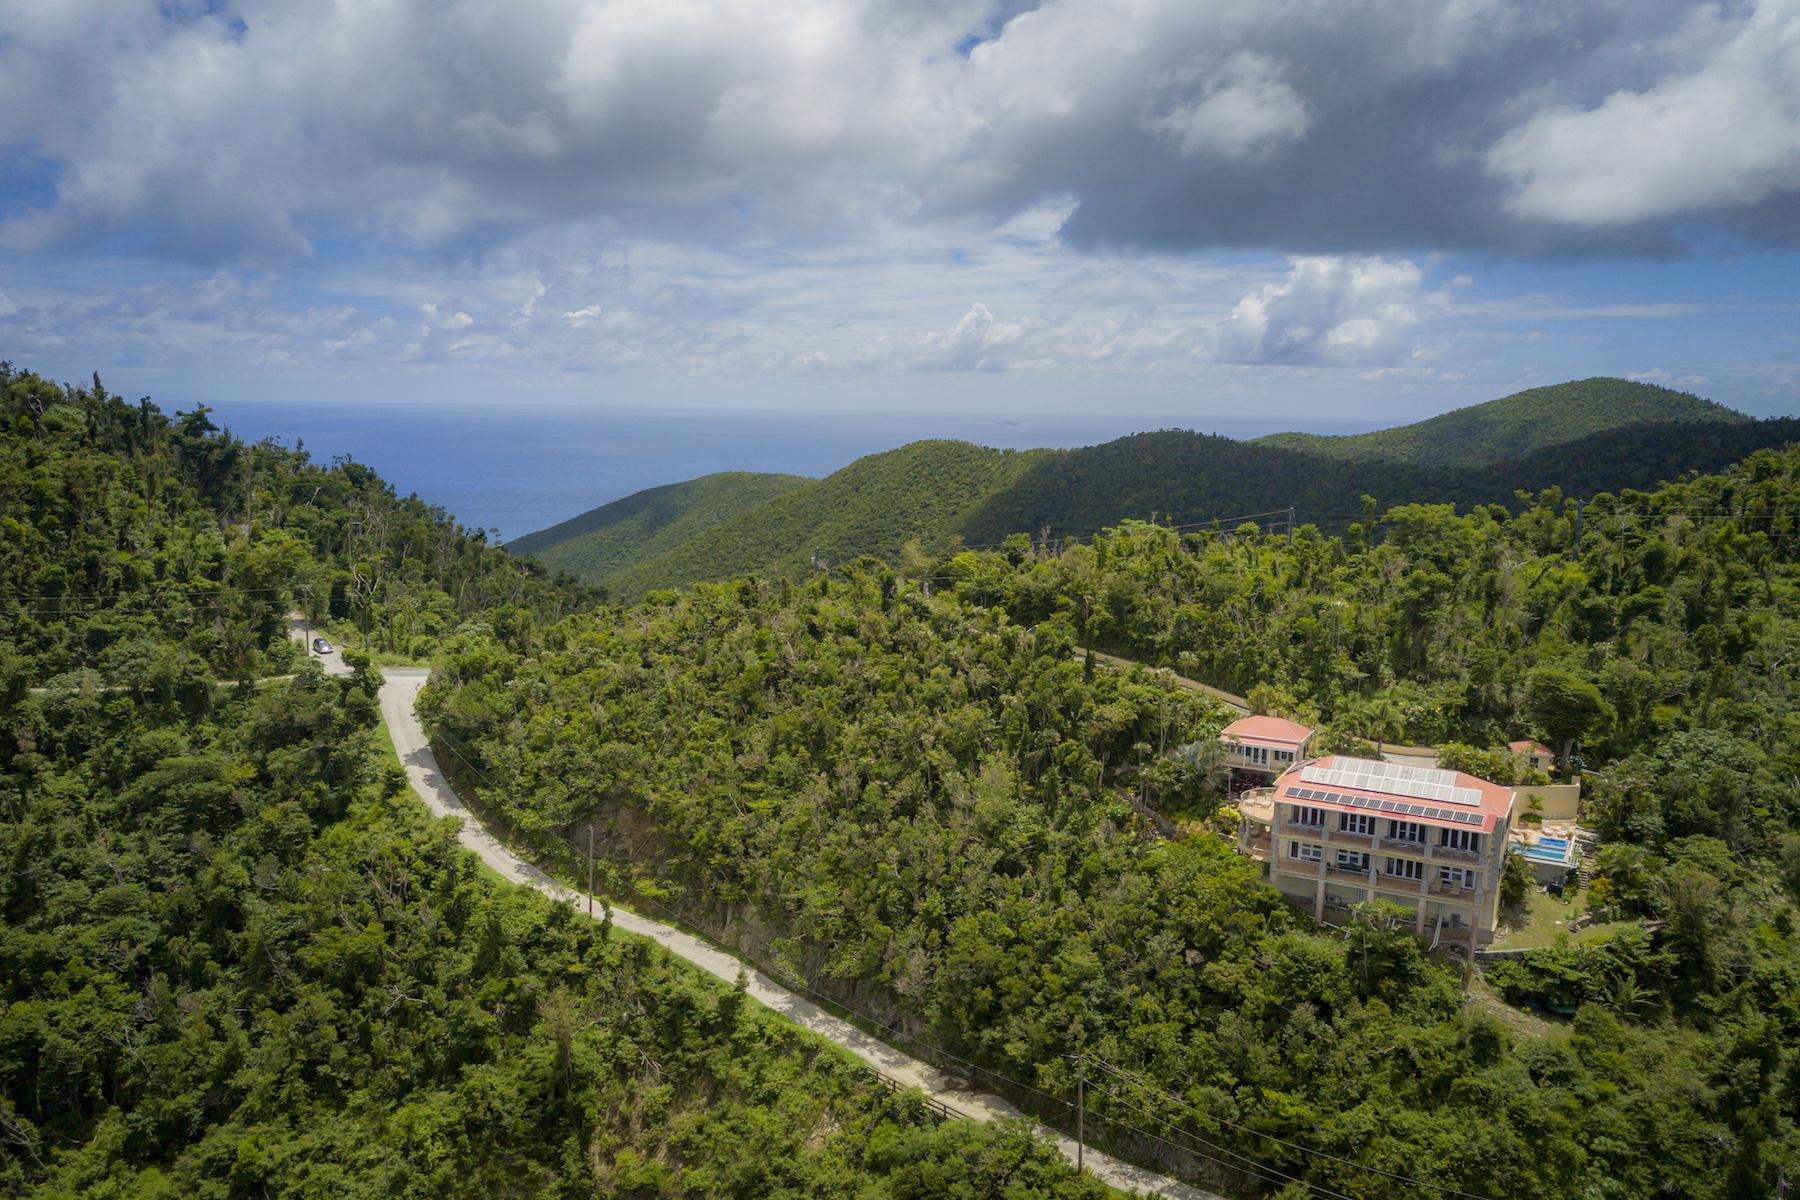 Single Family Homes für Verkauf beim Drake's View 9-25 Estate Carolina St John, Virgin Islands 00830 Amerikanische Jungferninseln